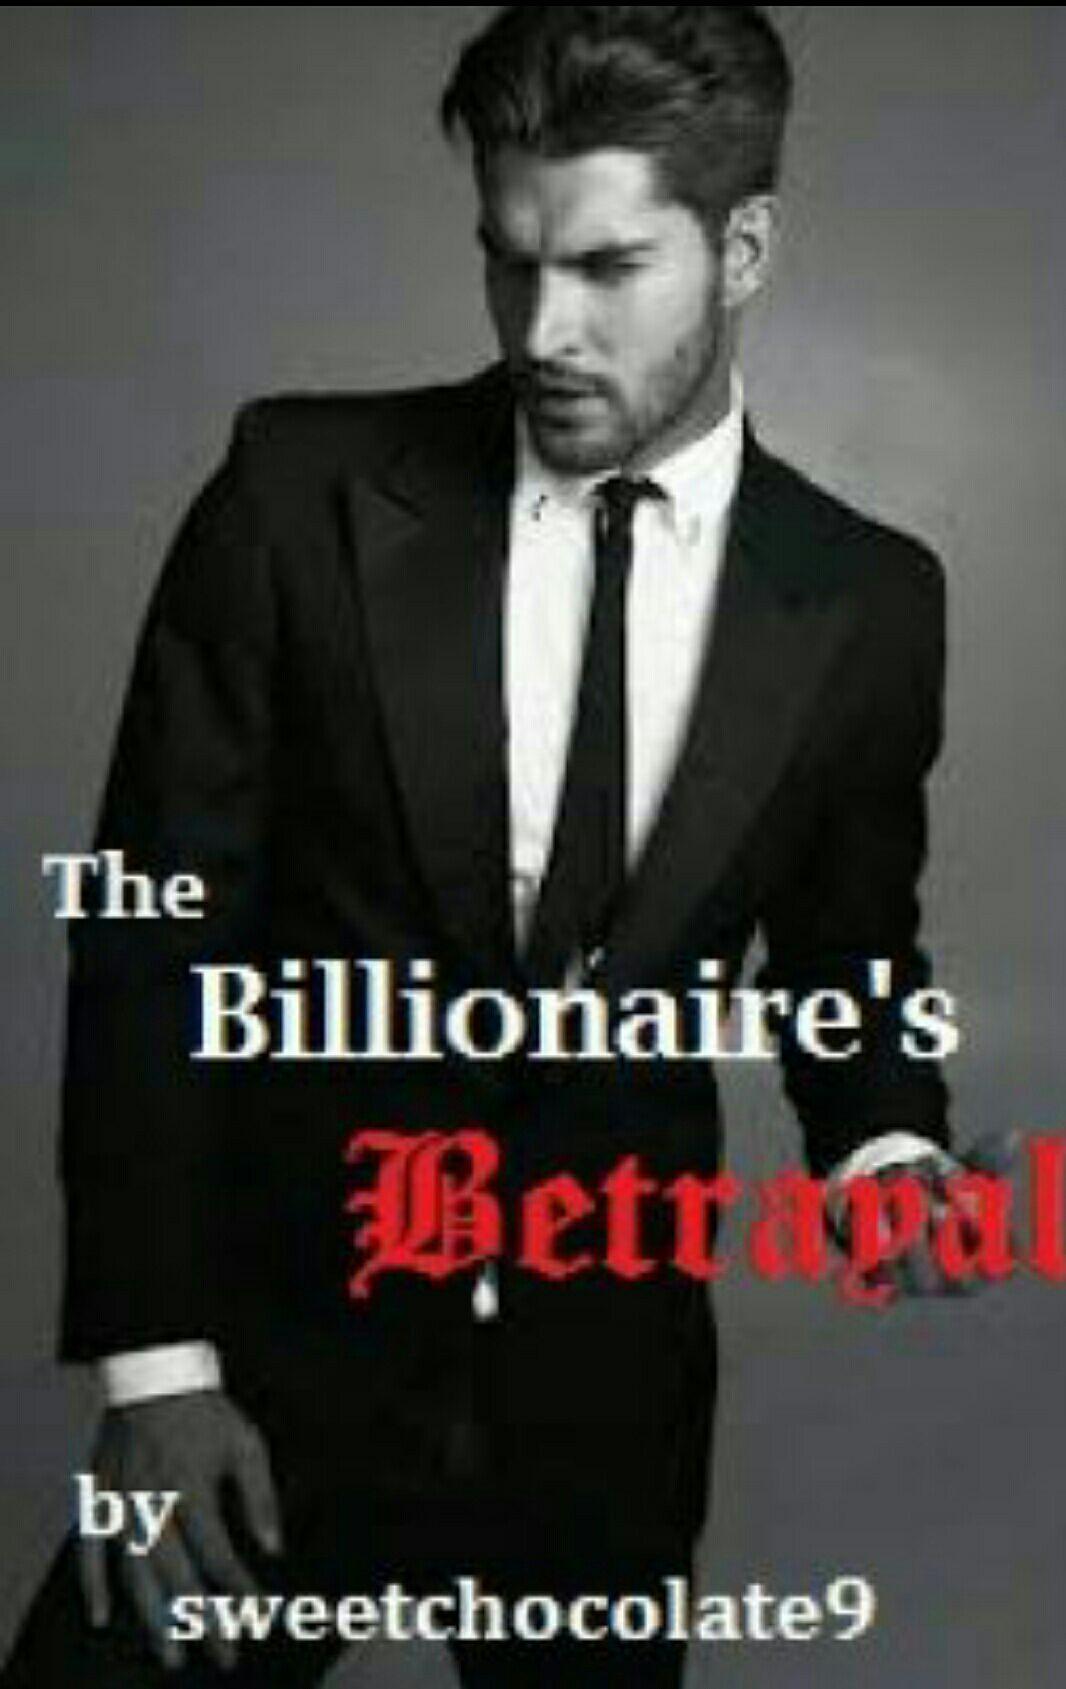 Best Books On Wattpad - The Billionaire's Betrayal - Wattpad